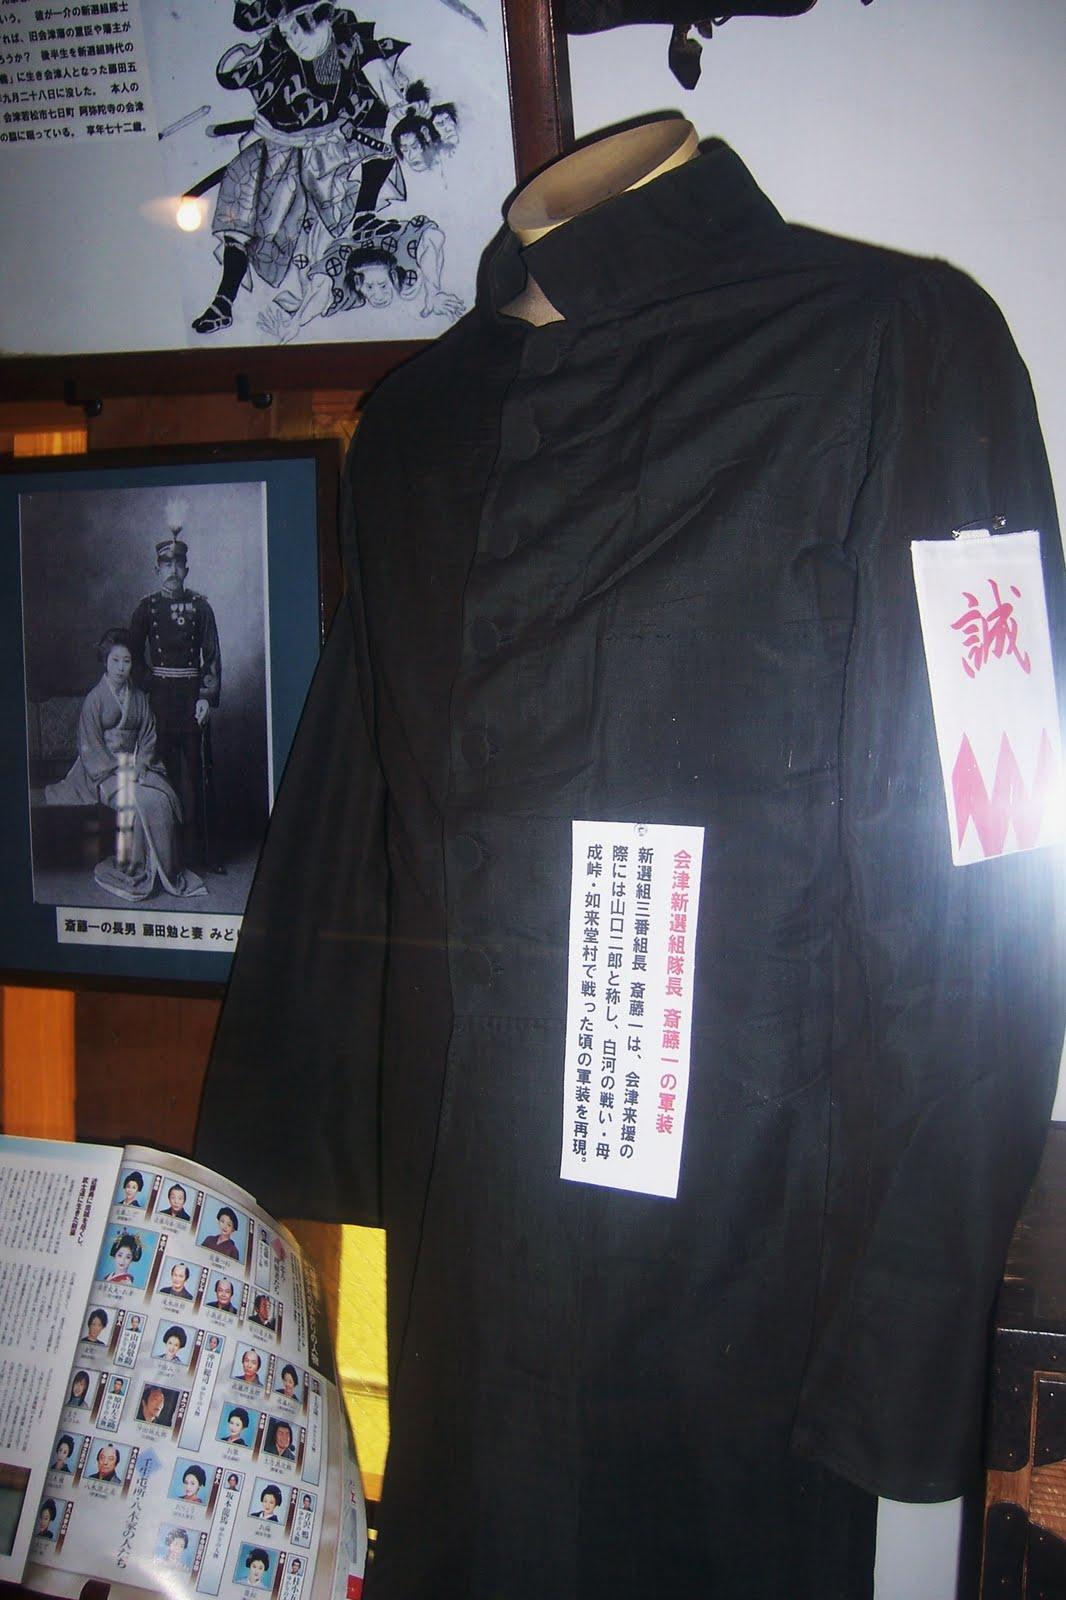 wakamatsu black singles Gai yuki (結城 凱 yūki gai) was black condor but every single sentai toshihide wakamatsu who portrays gai yuki is revealed as one of the two guest.